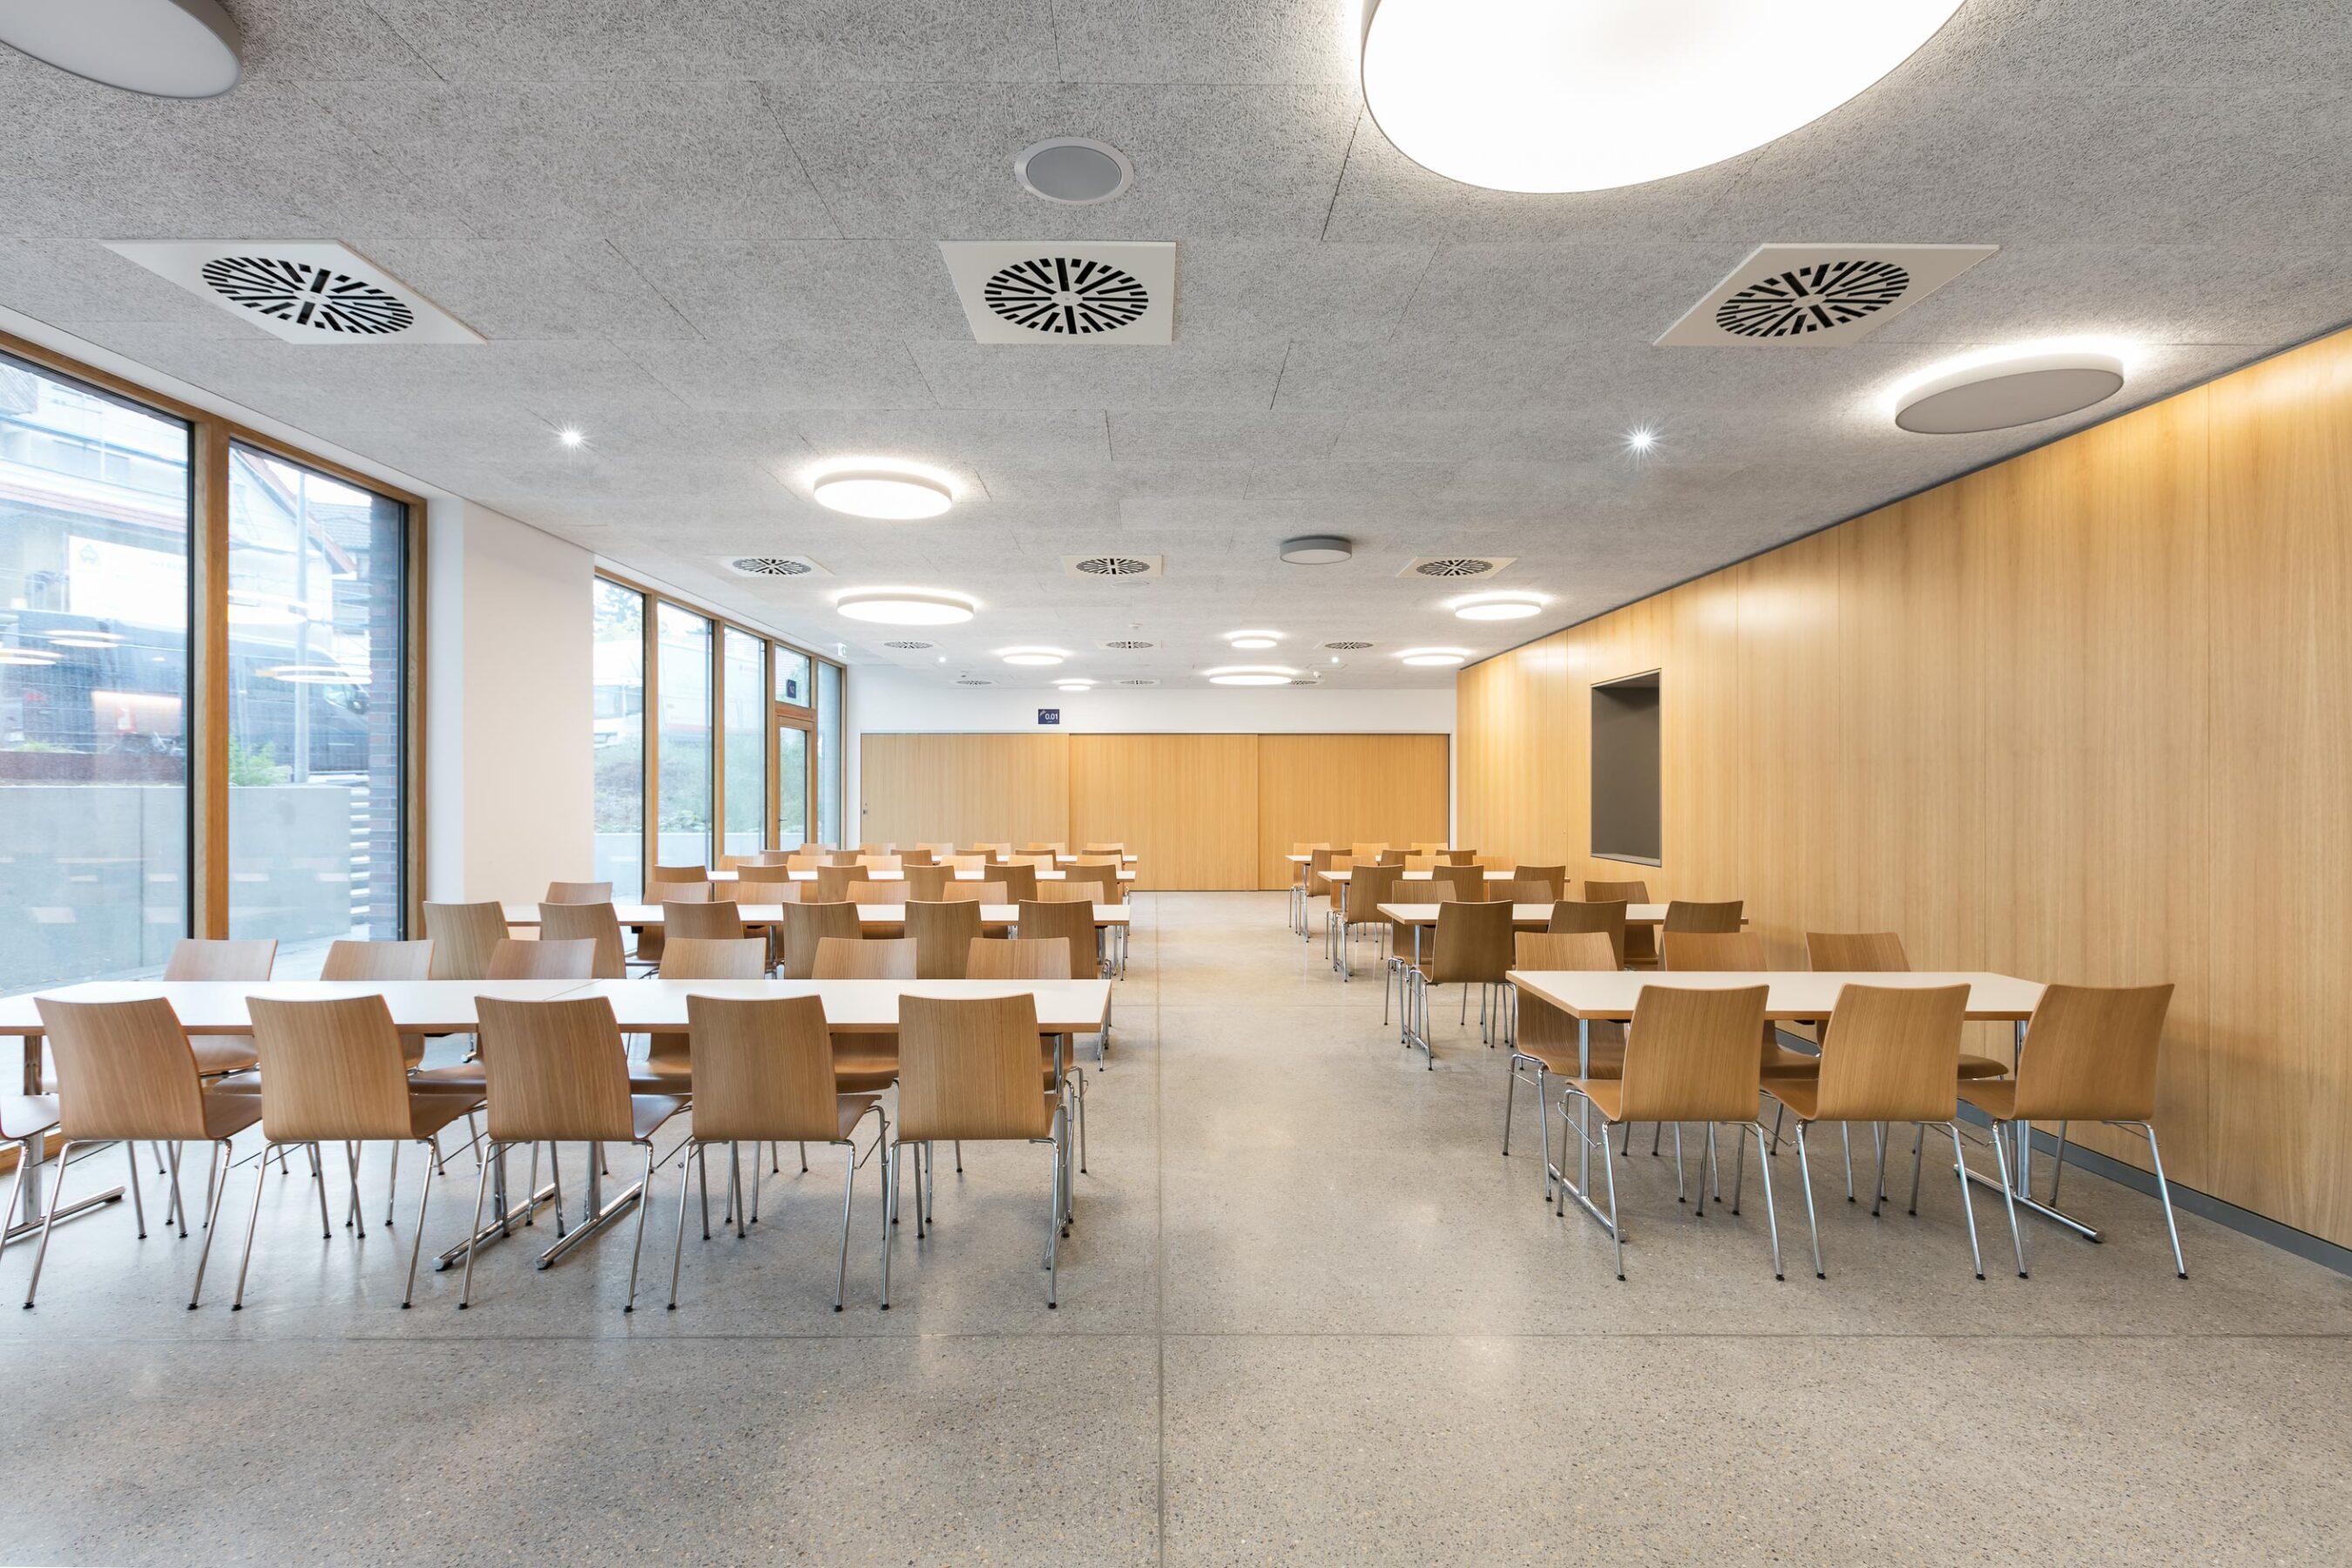 feco-feederle│partition walls│Burg Gymnasium Schorndorf